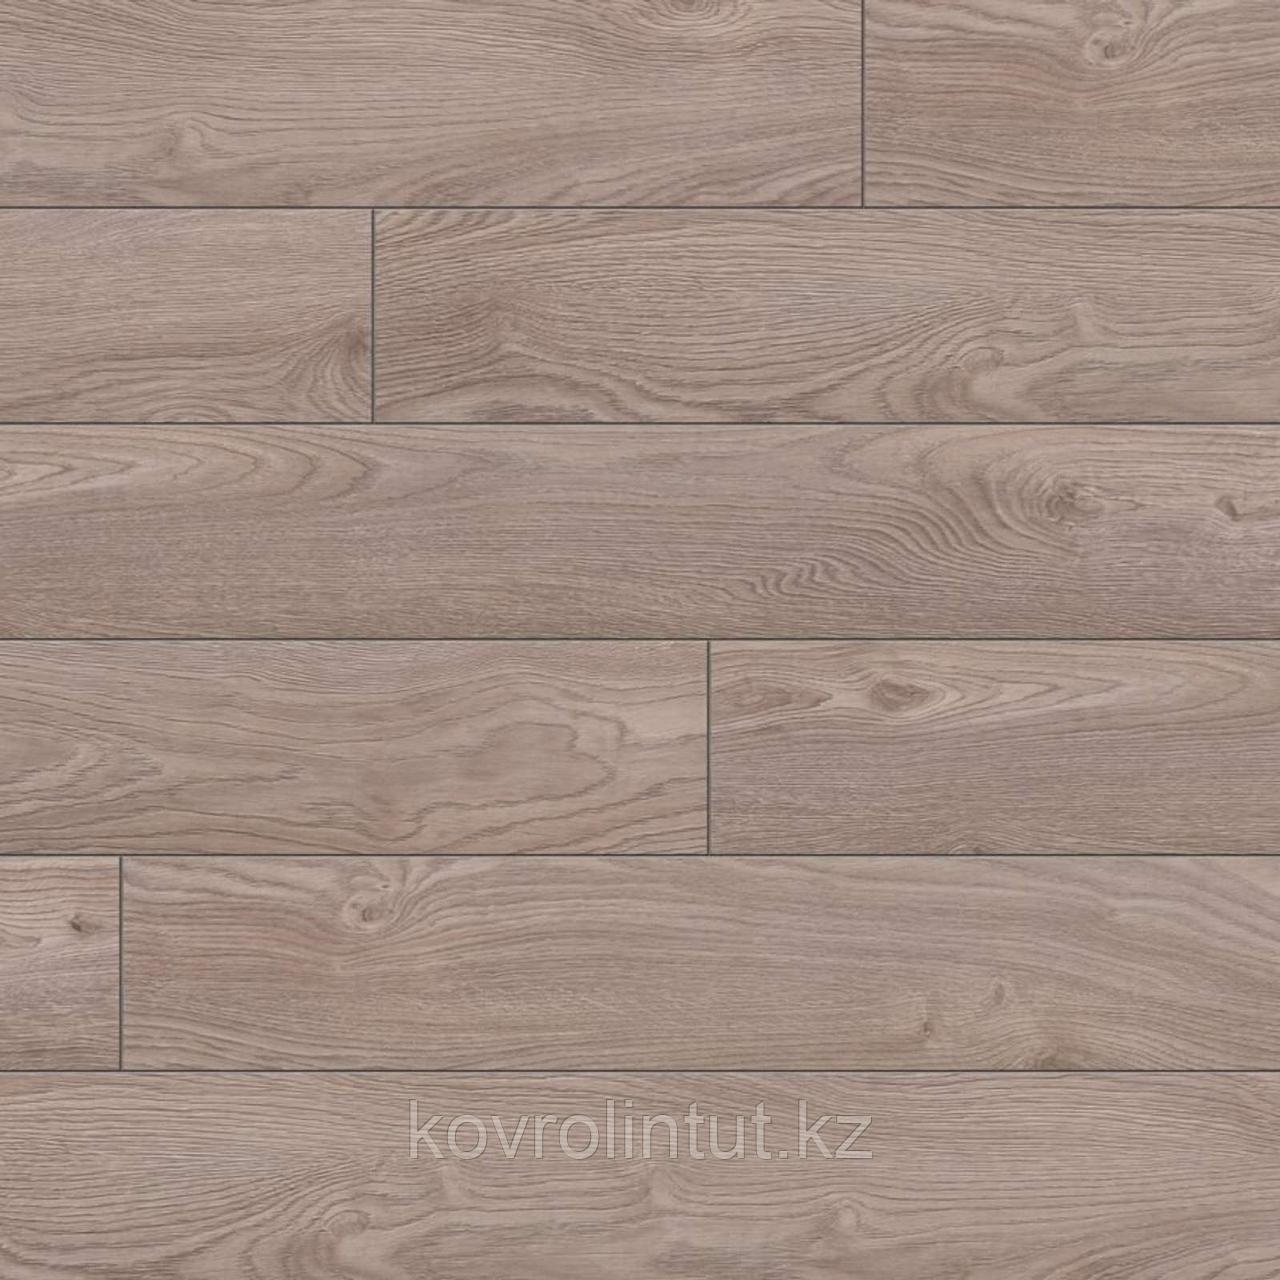 Ламинат Classen Impression WR 52804 Grenada Oak, 1285x158x10мм, 33кл (1 ,624м2, 8шт в уп)